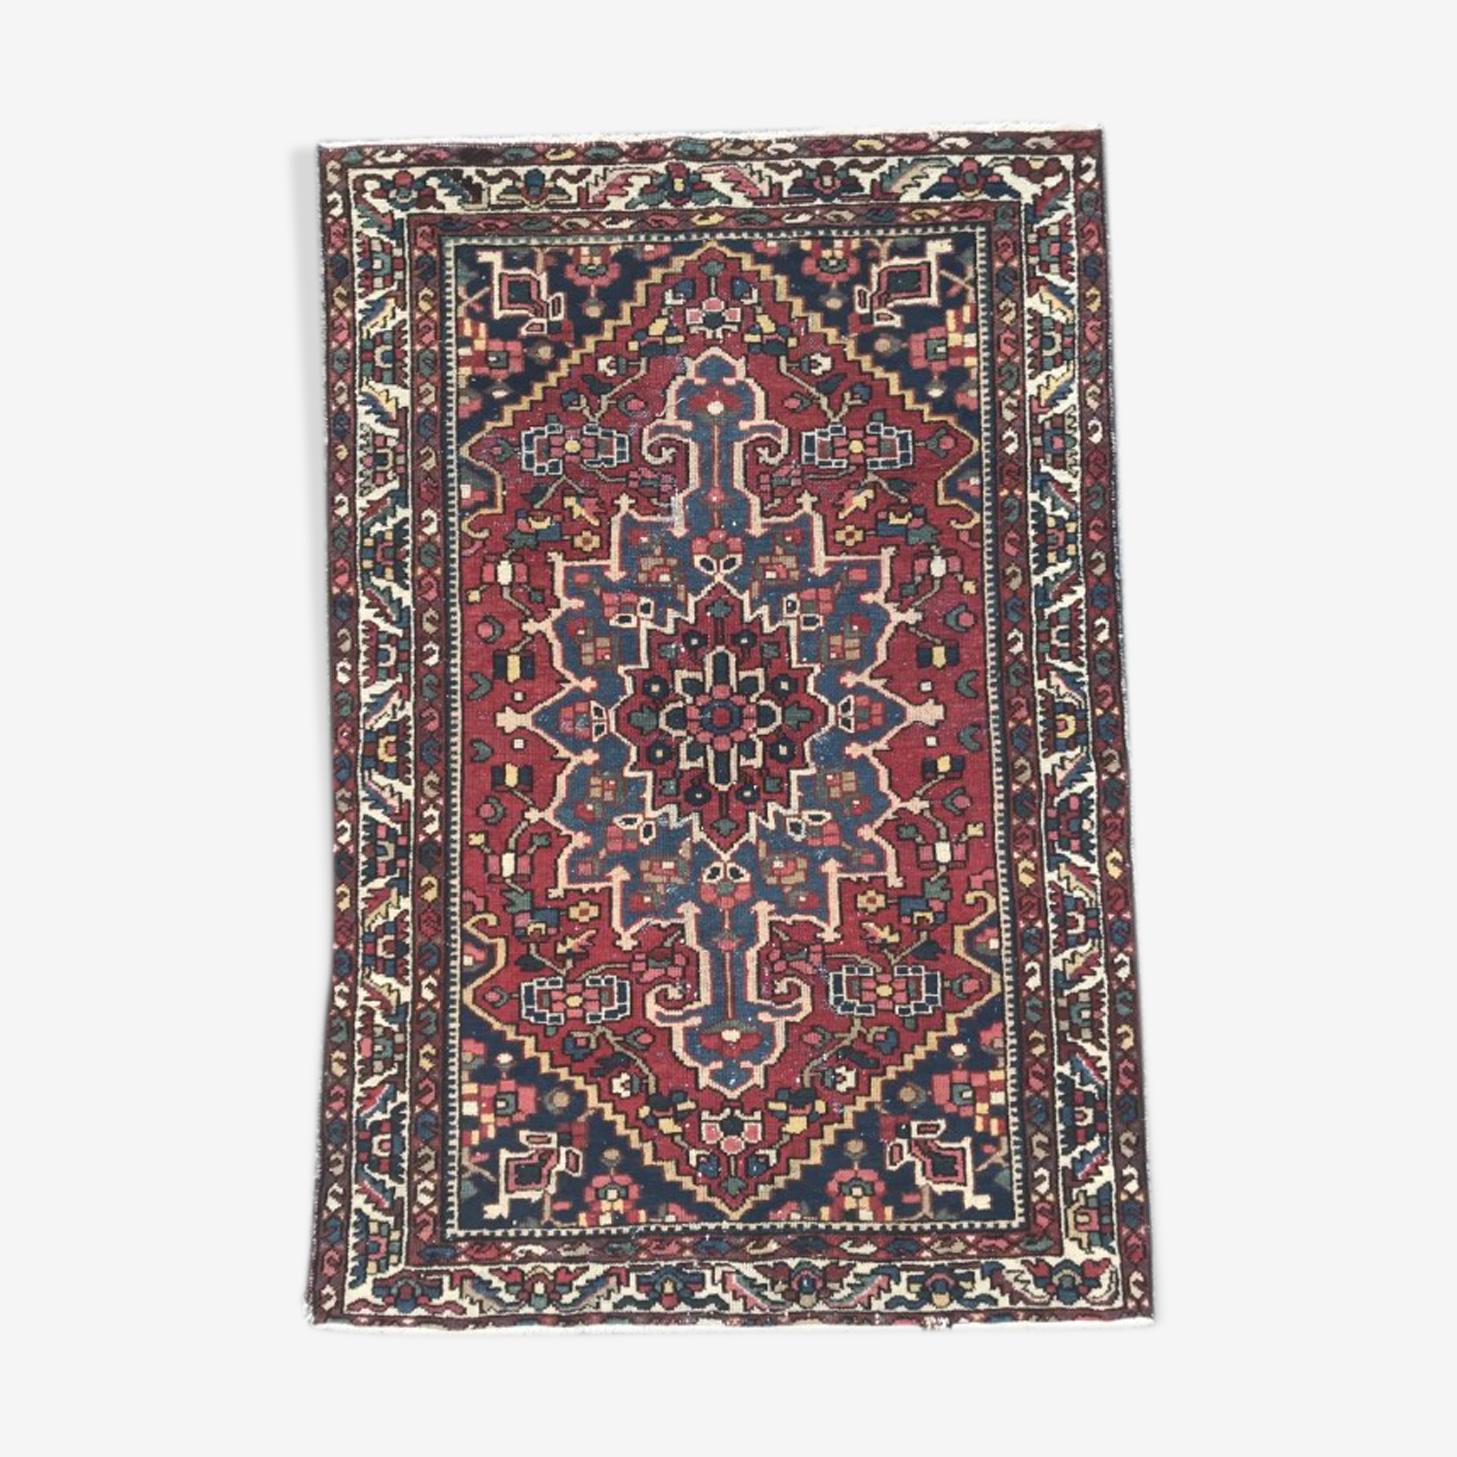 Tapis ancien persan bakhtiar 137x202 cm